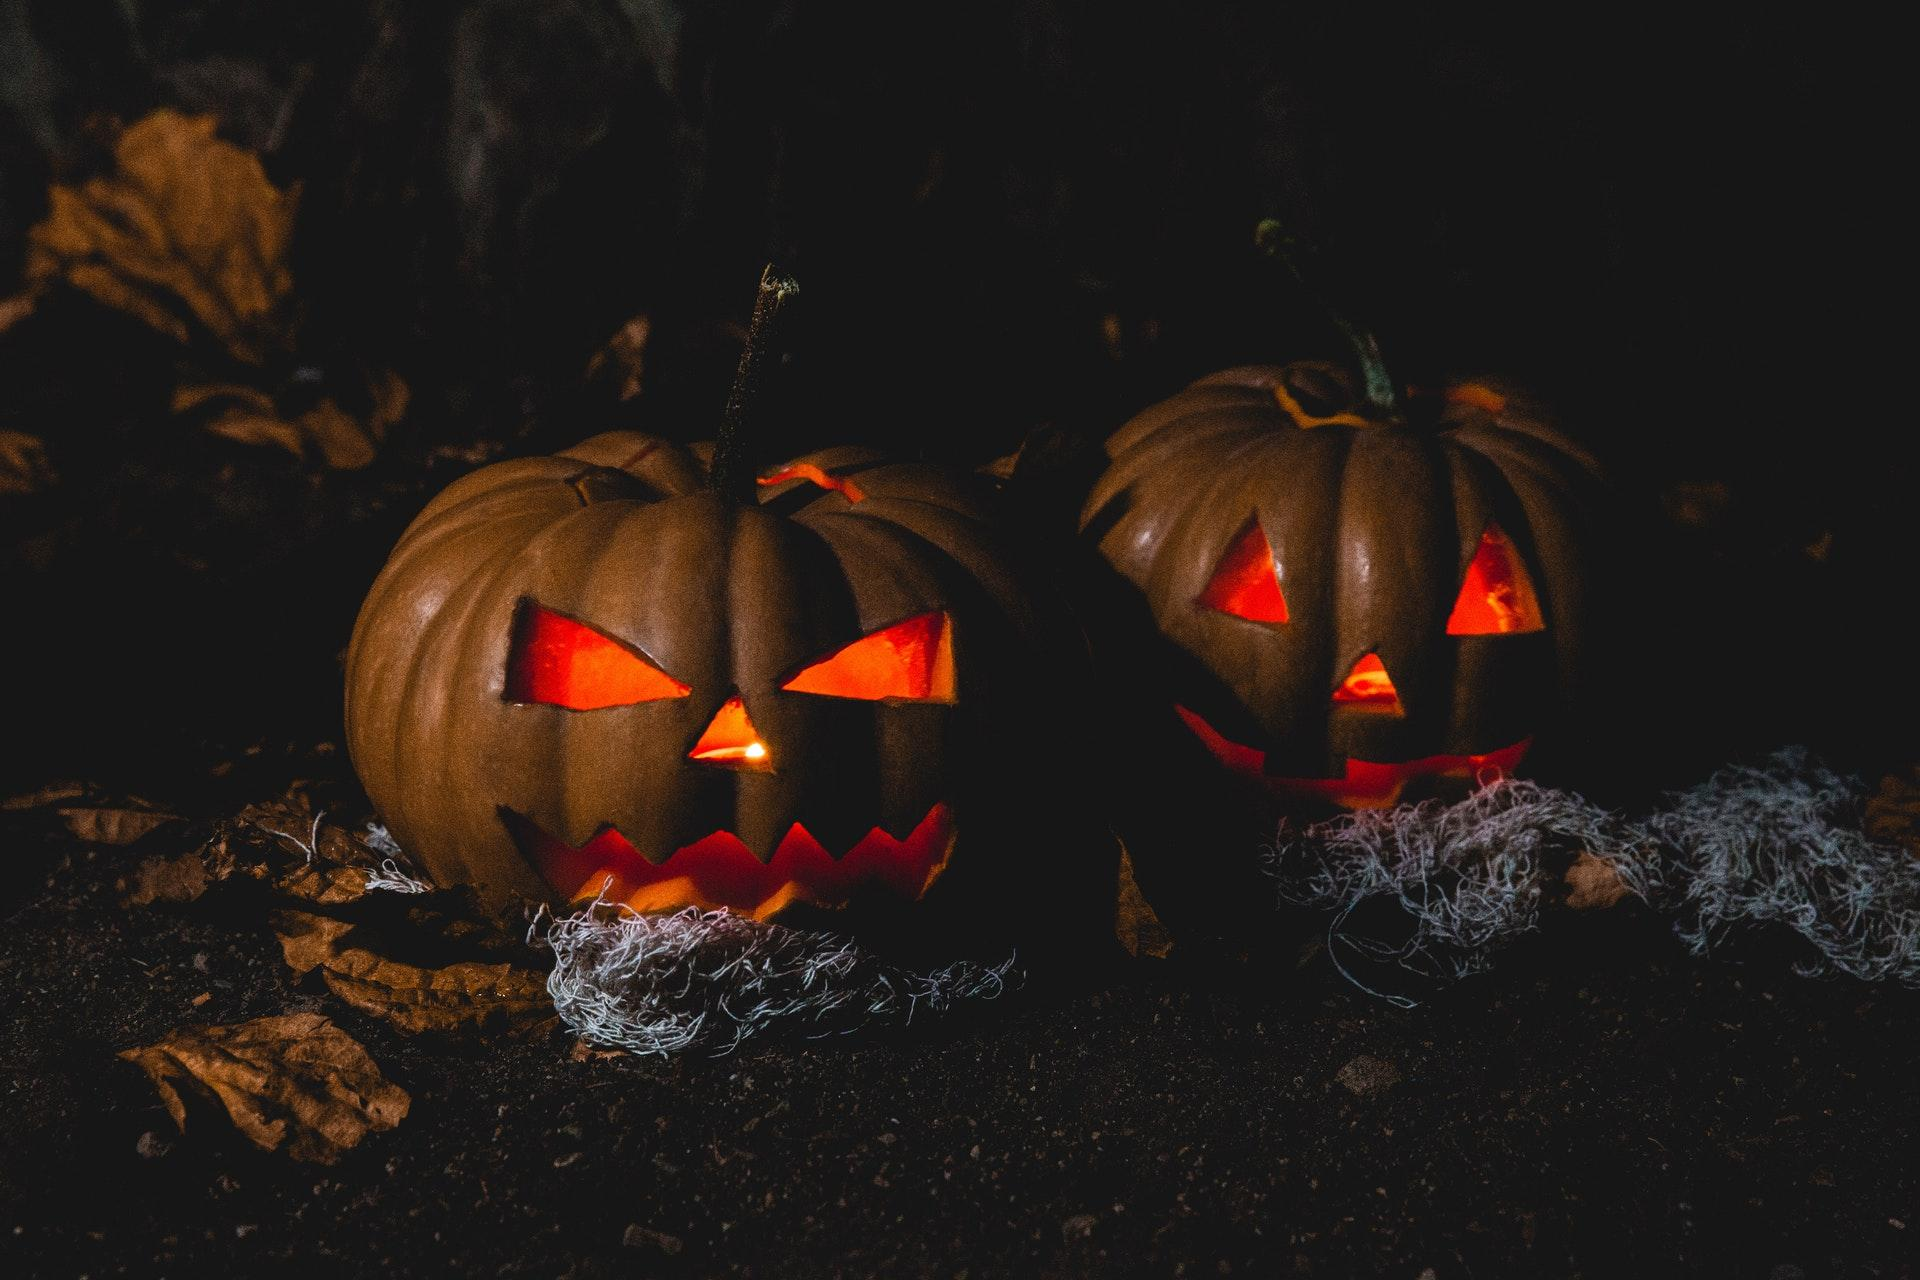 Halloween Two Pumpkins